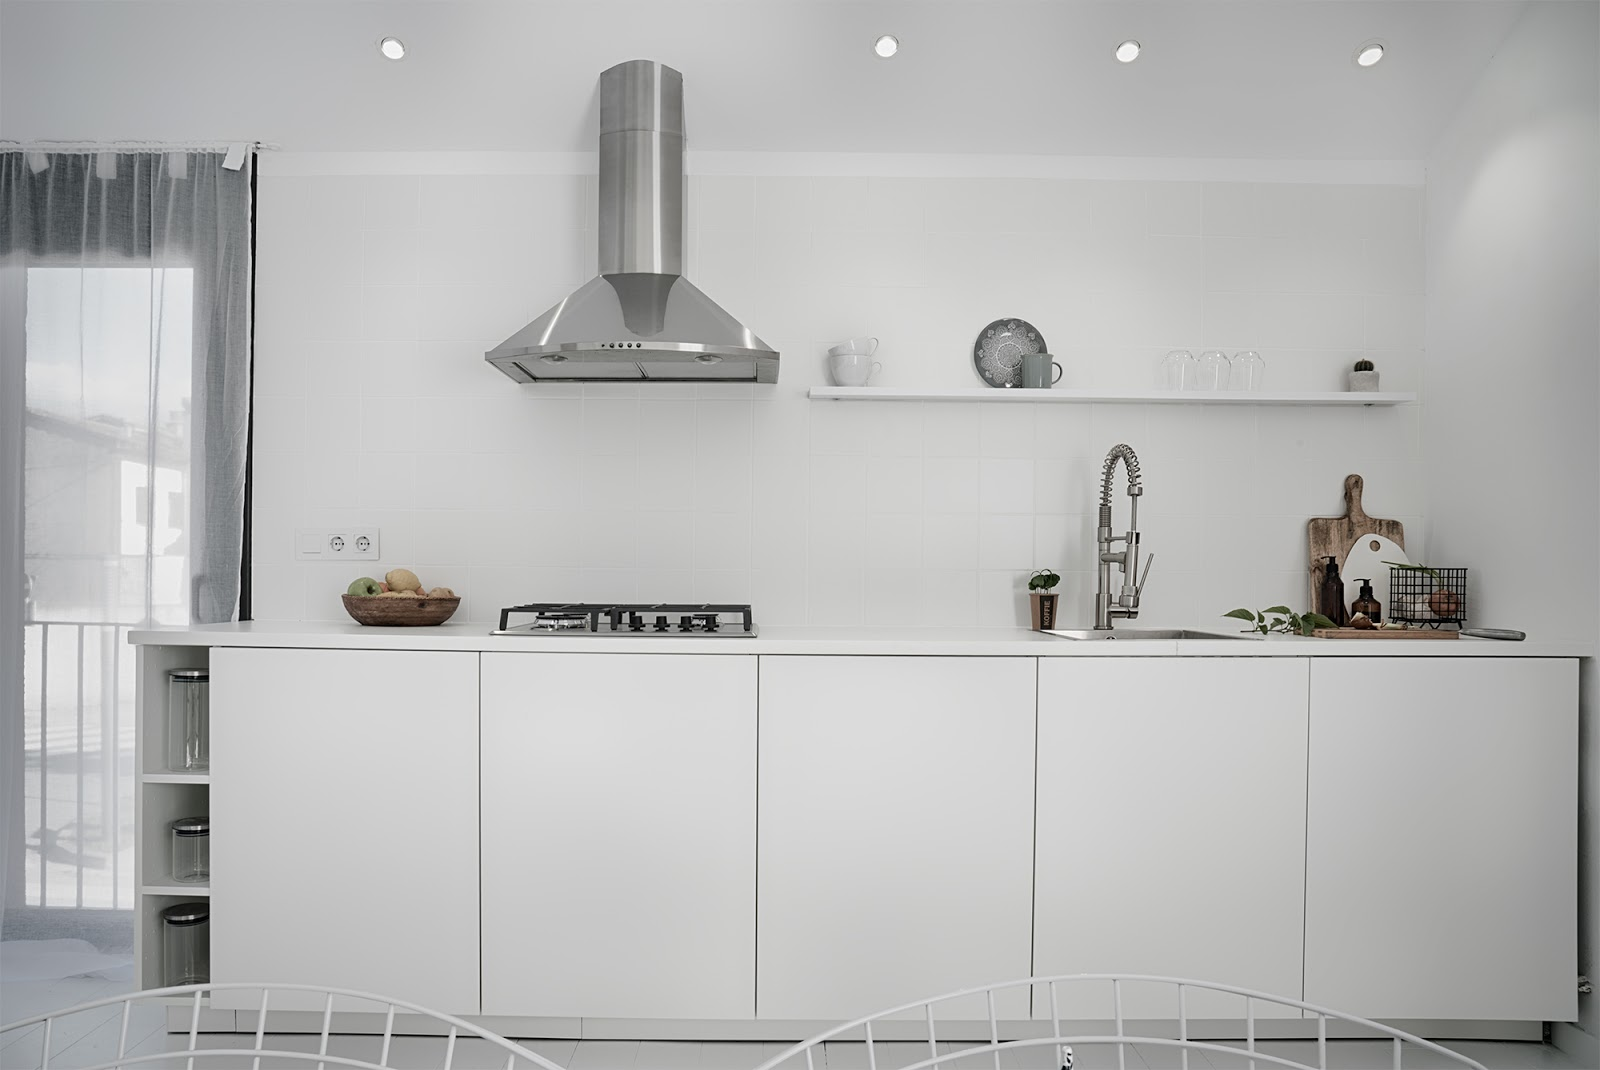 cocina abierta, cocina, kitchen, concepto abierto, estilo nordico, interior, white, kitchen, ikea,